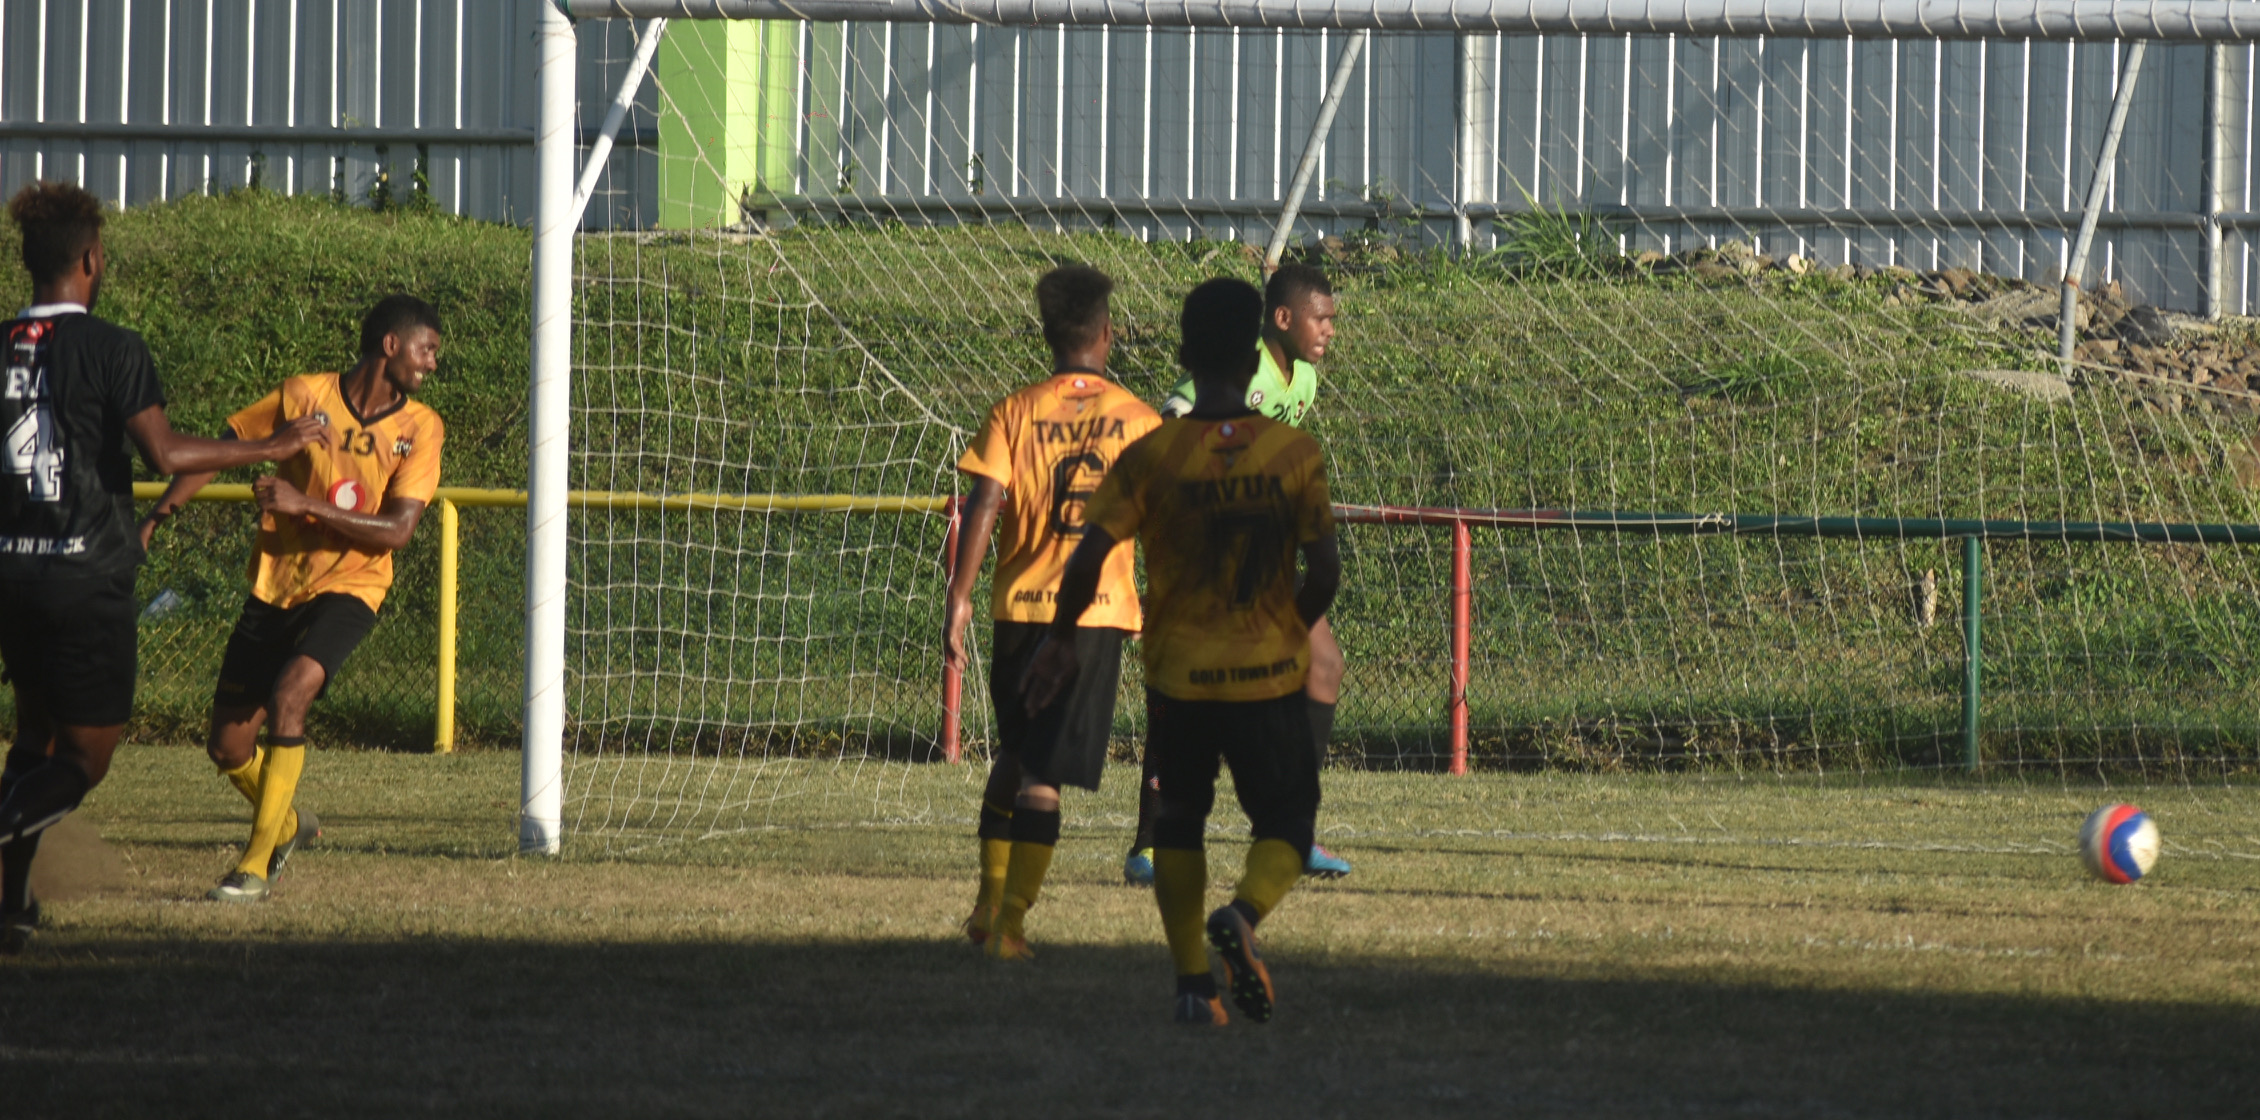 Action from the Tavua-Rewa match.Photo: Waisea Nasokia